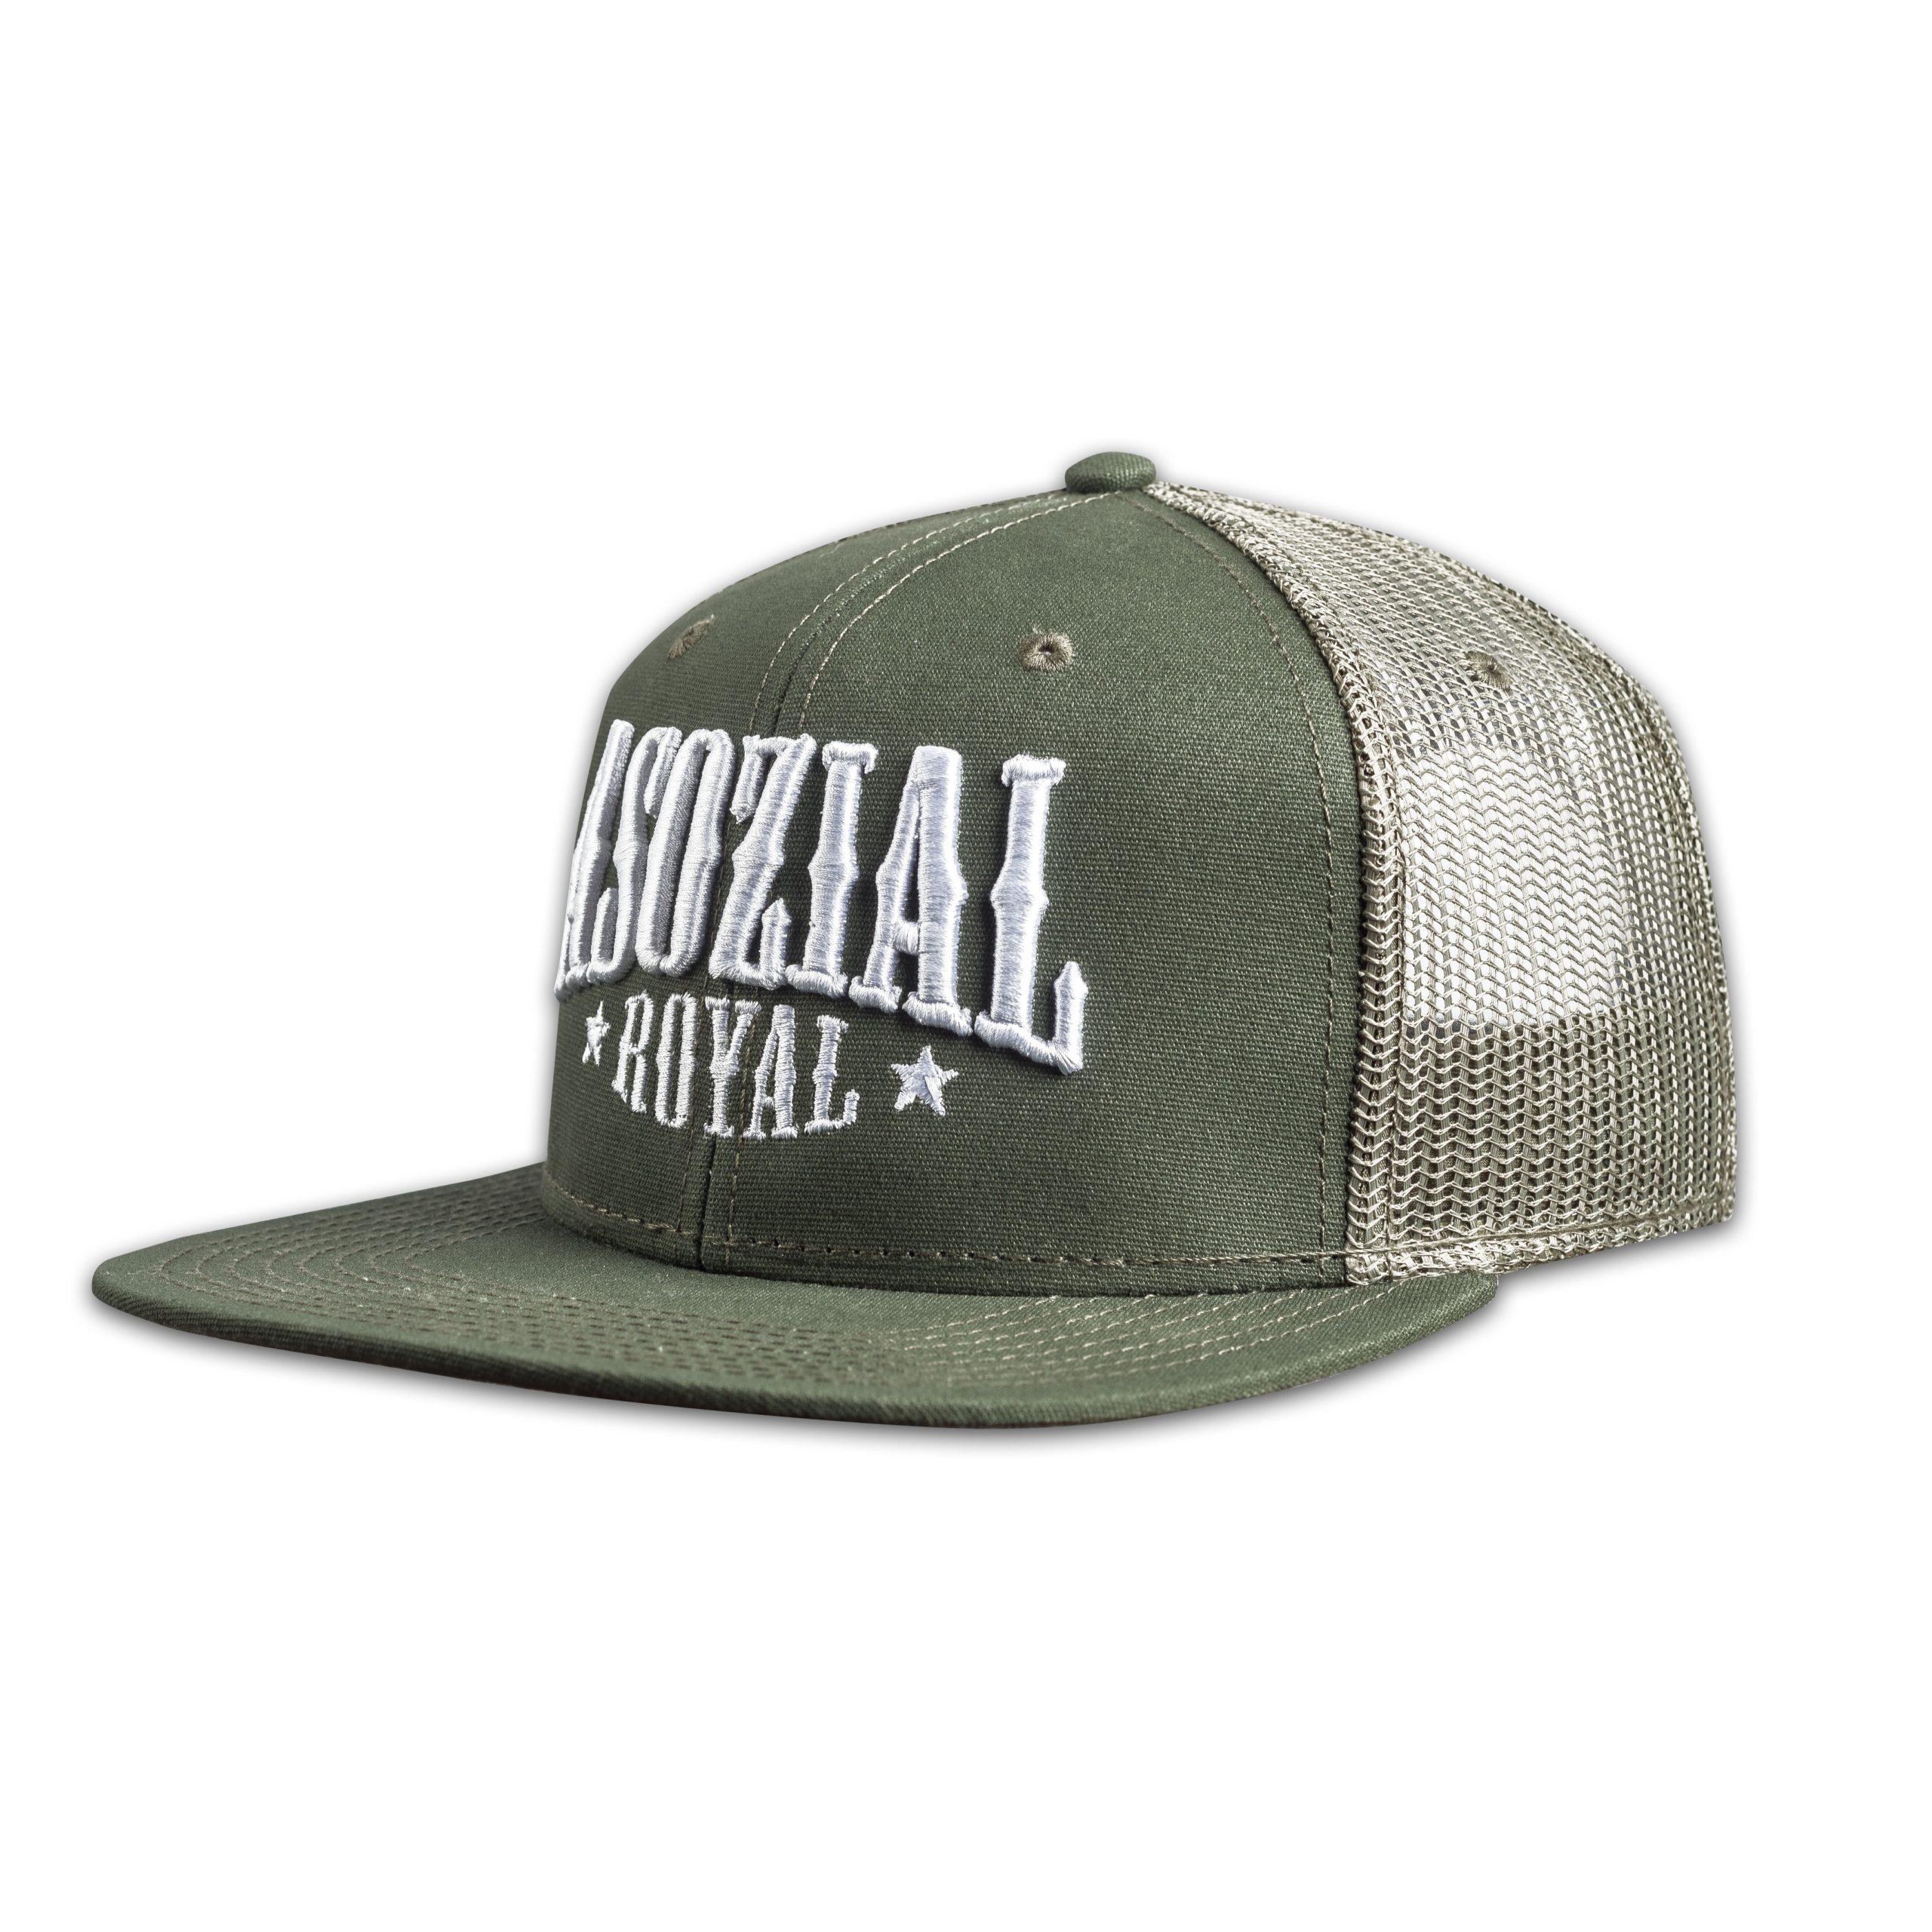 Trucker-Snapback Mesh Asozial Royal Schwarz